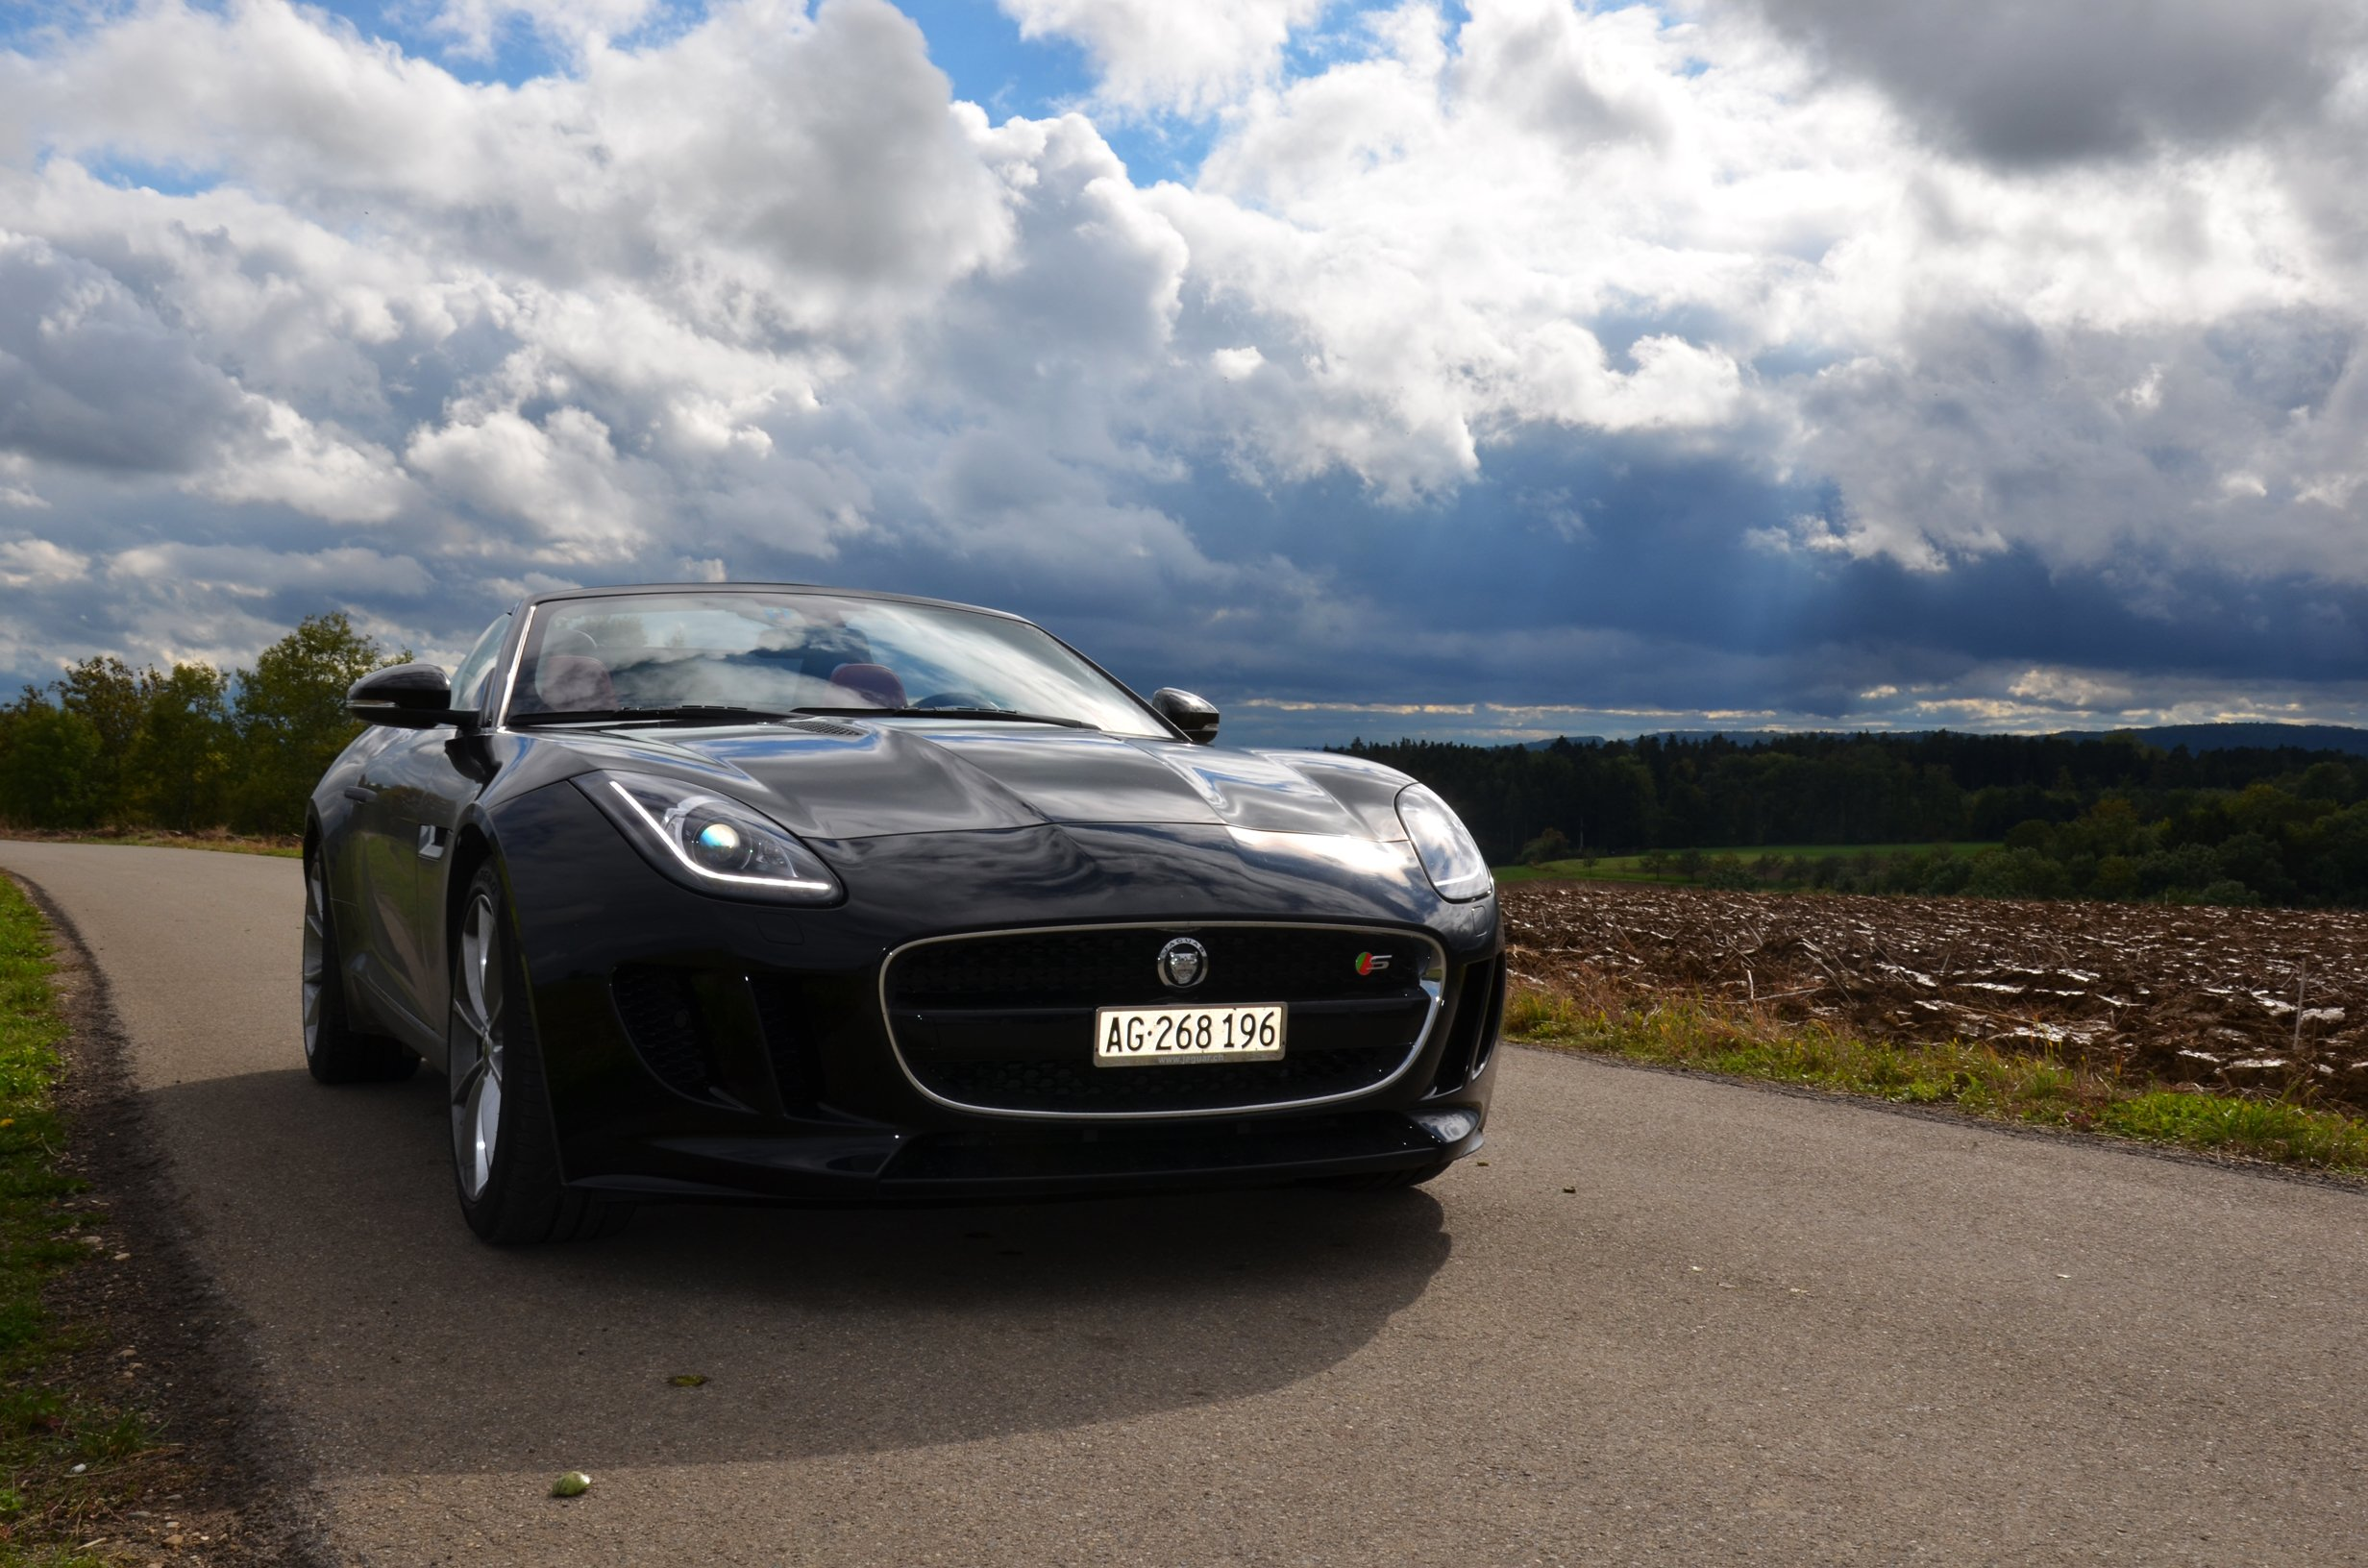 Fahrbericht: Jaguar F-Type V6 S